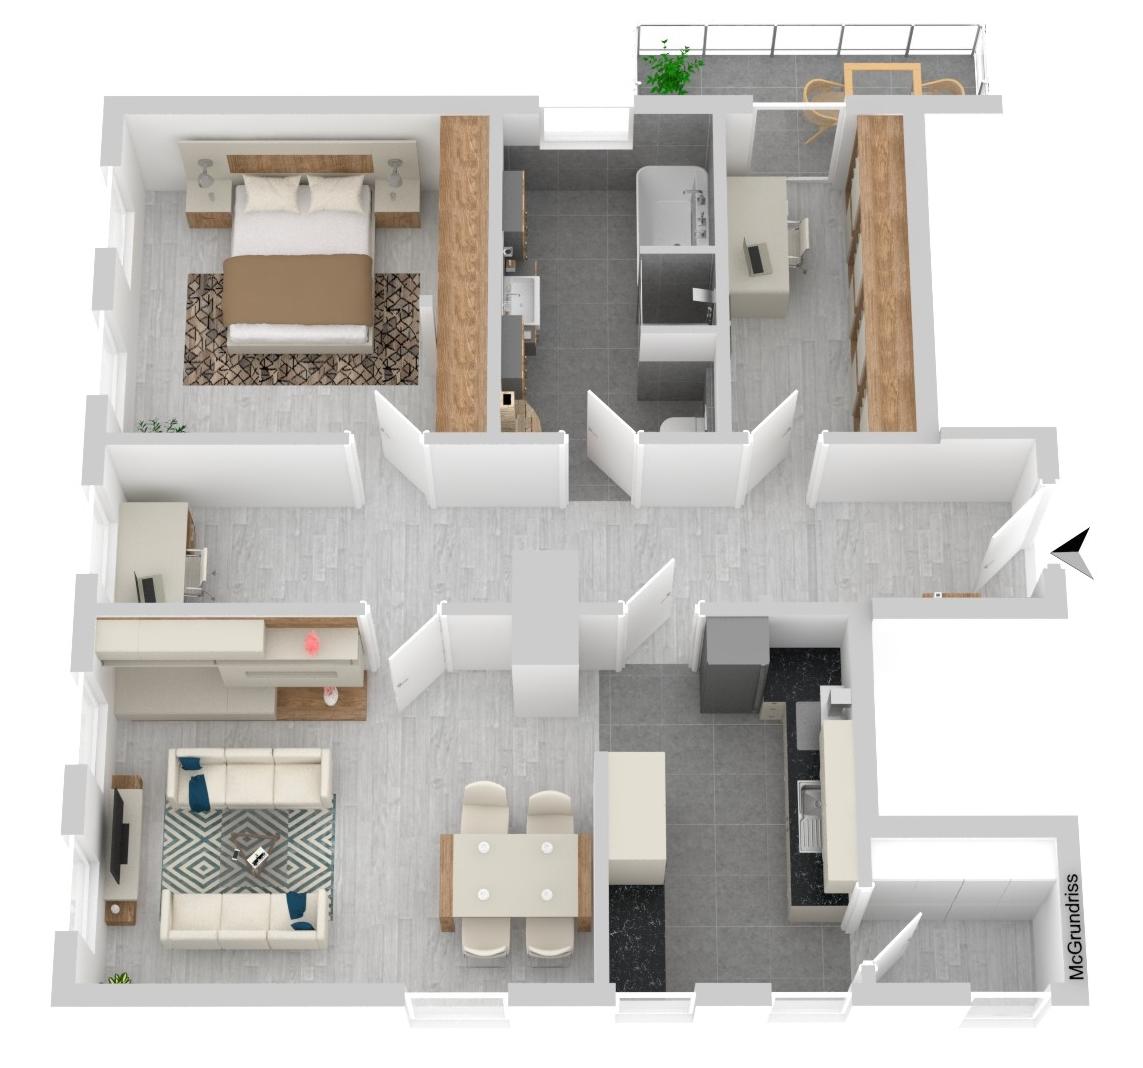 Wohnung Nr. 4 (98,77 m²)